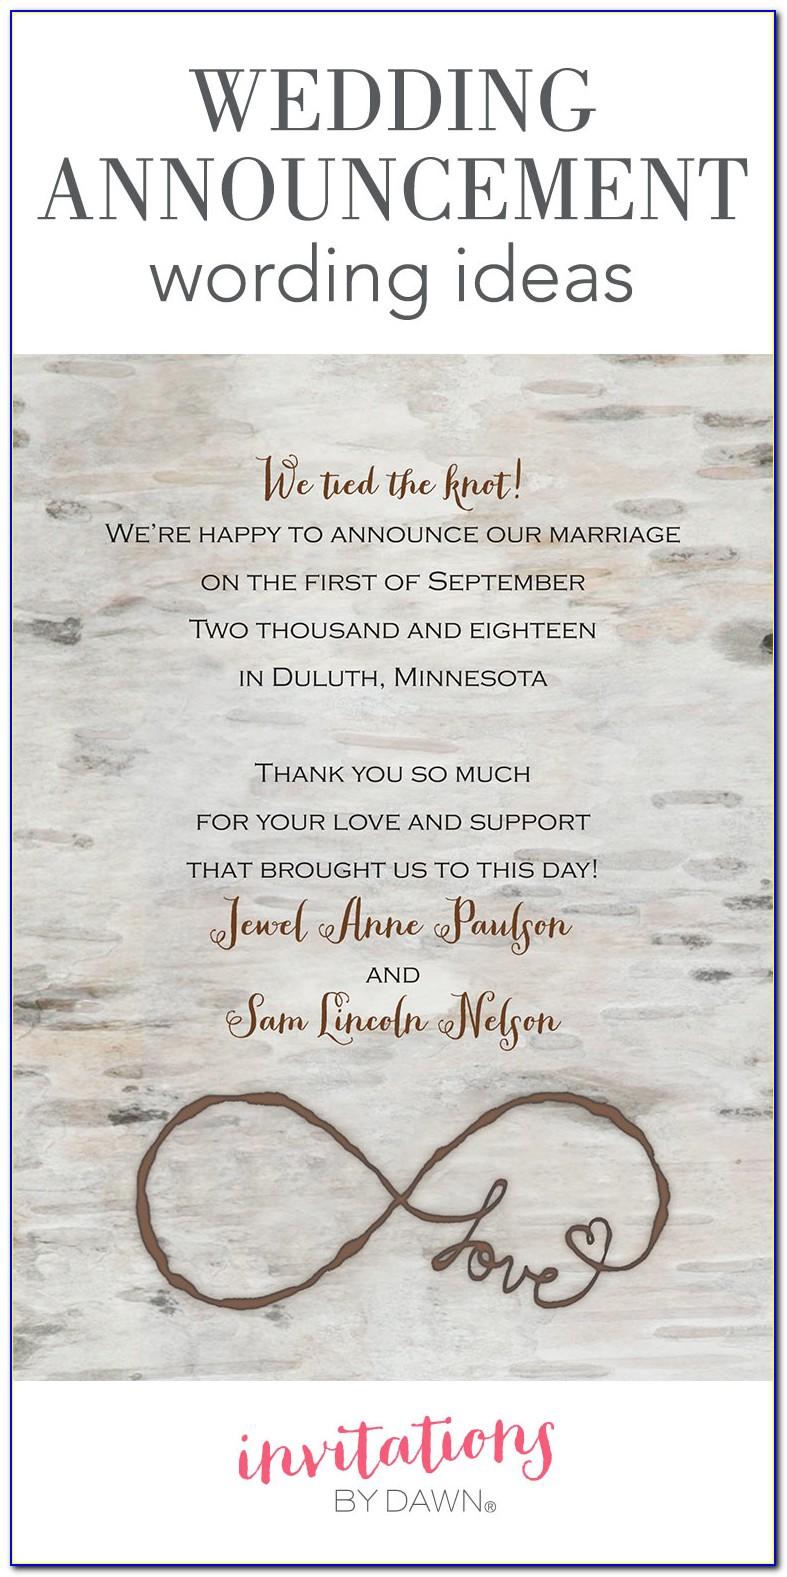 Destination Wedding Invitations Wording